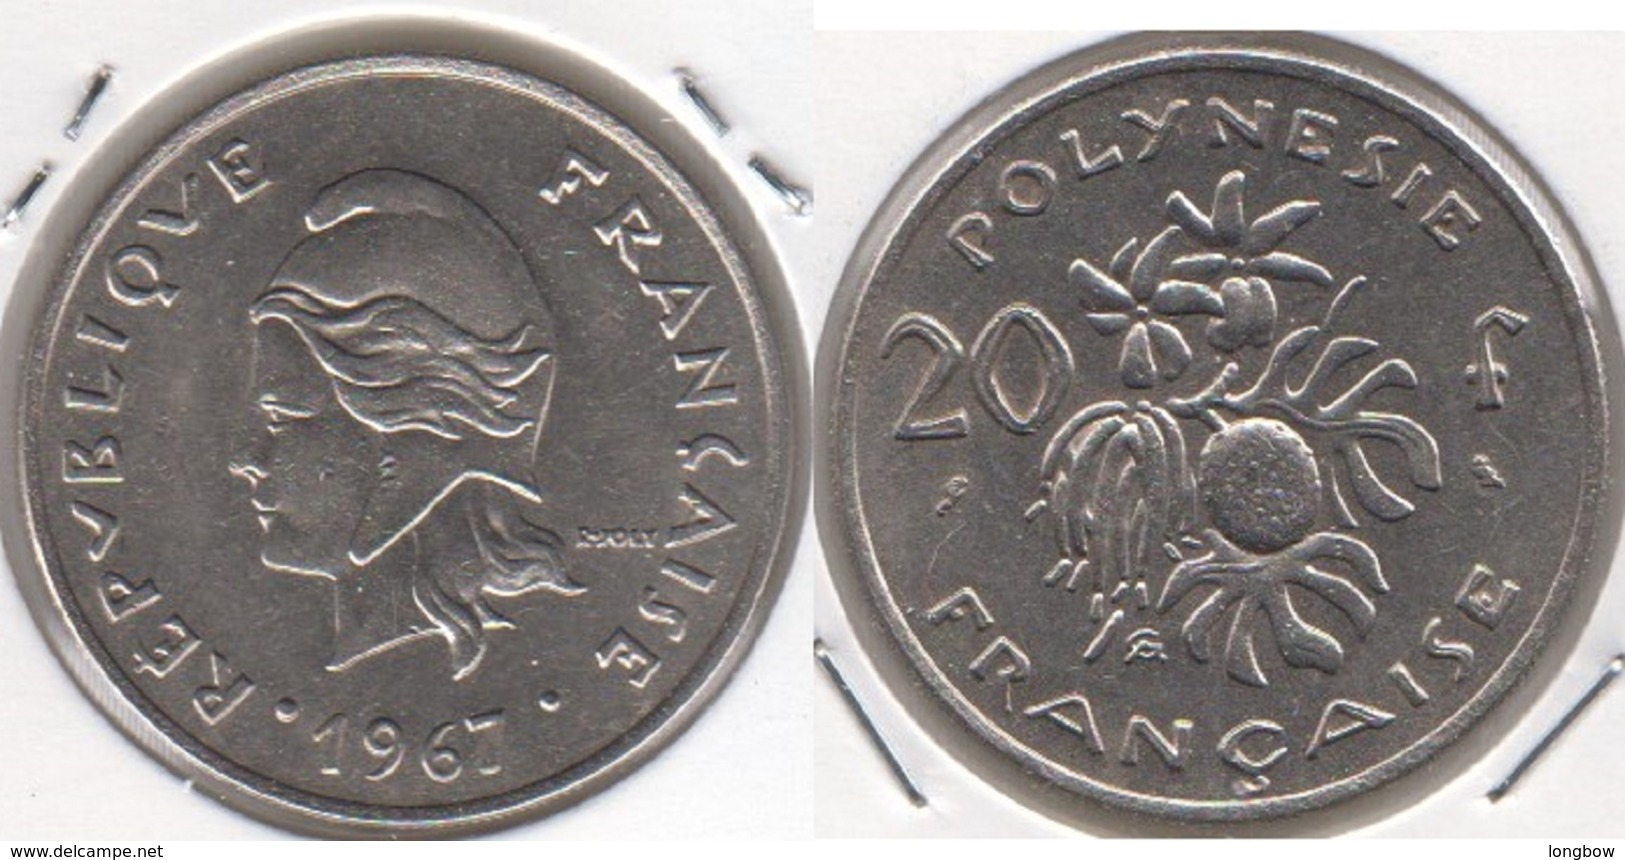 Polinesia Francese 20 Francs 1967 KM#6 - Used - Polynésie Française